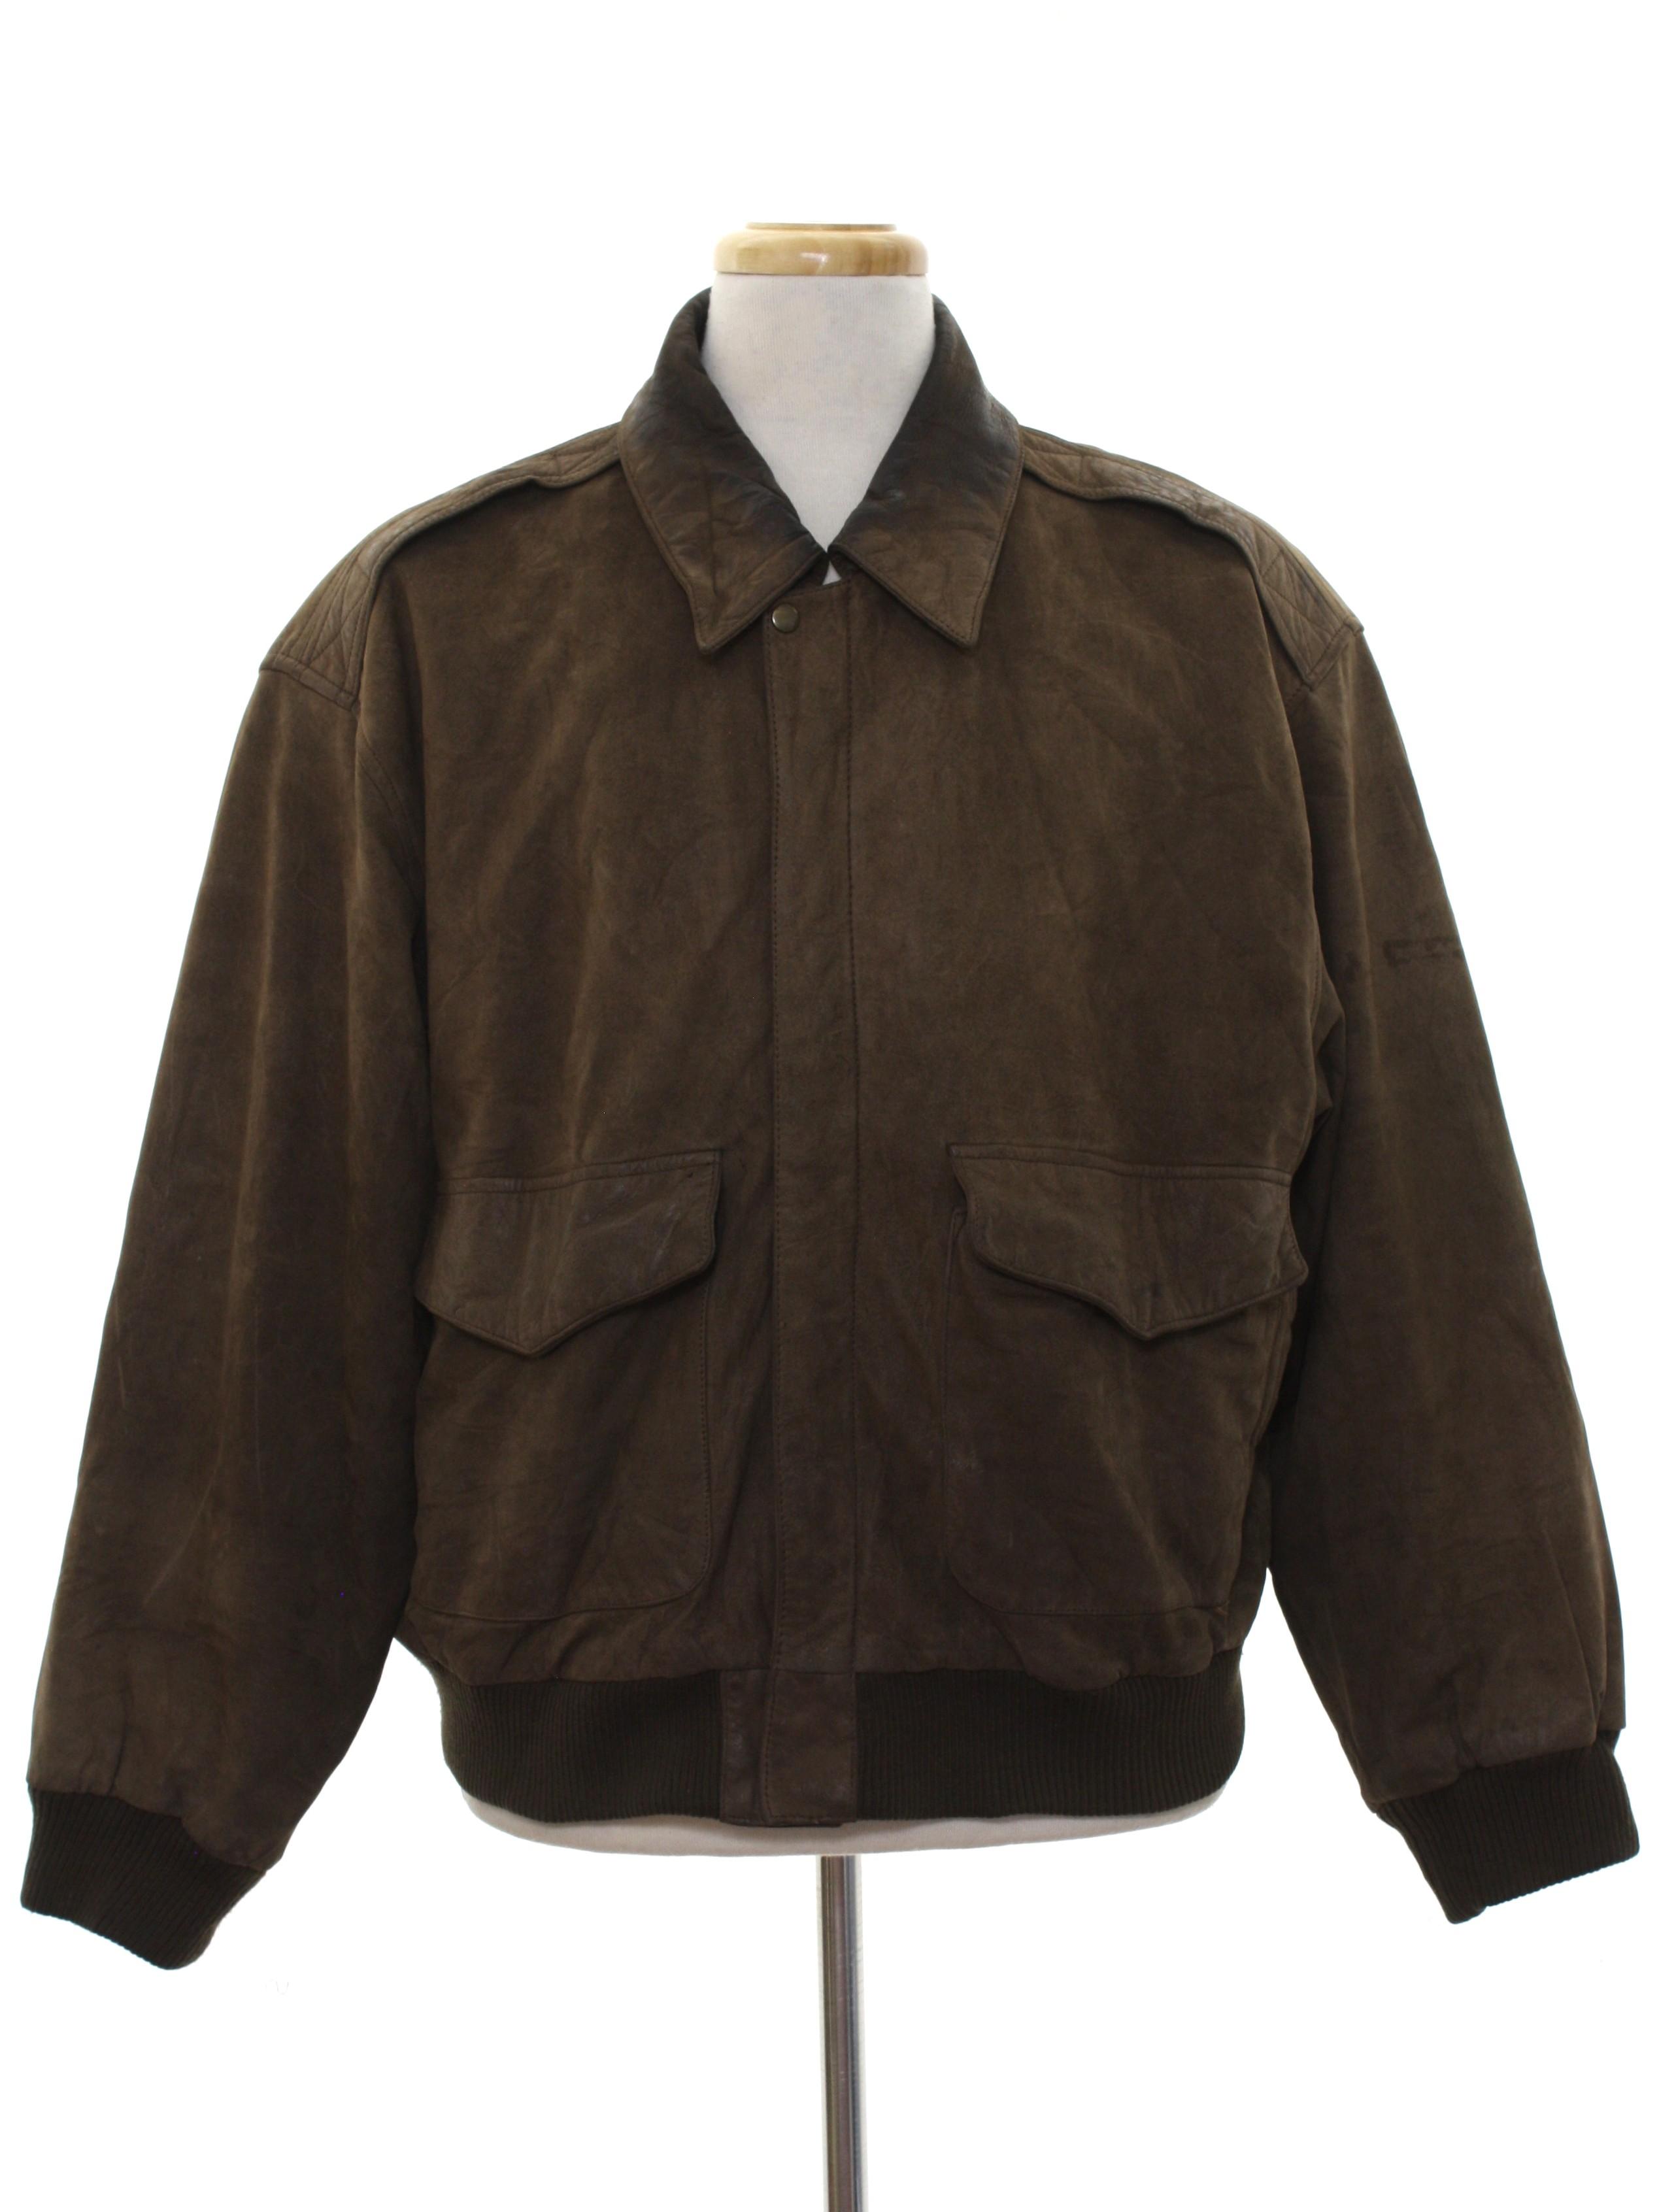 Mens black leather bomber jacket ribbed collar